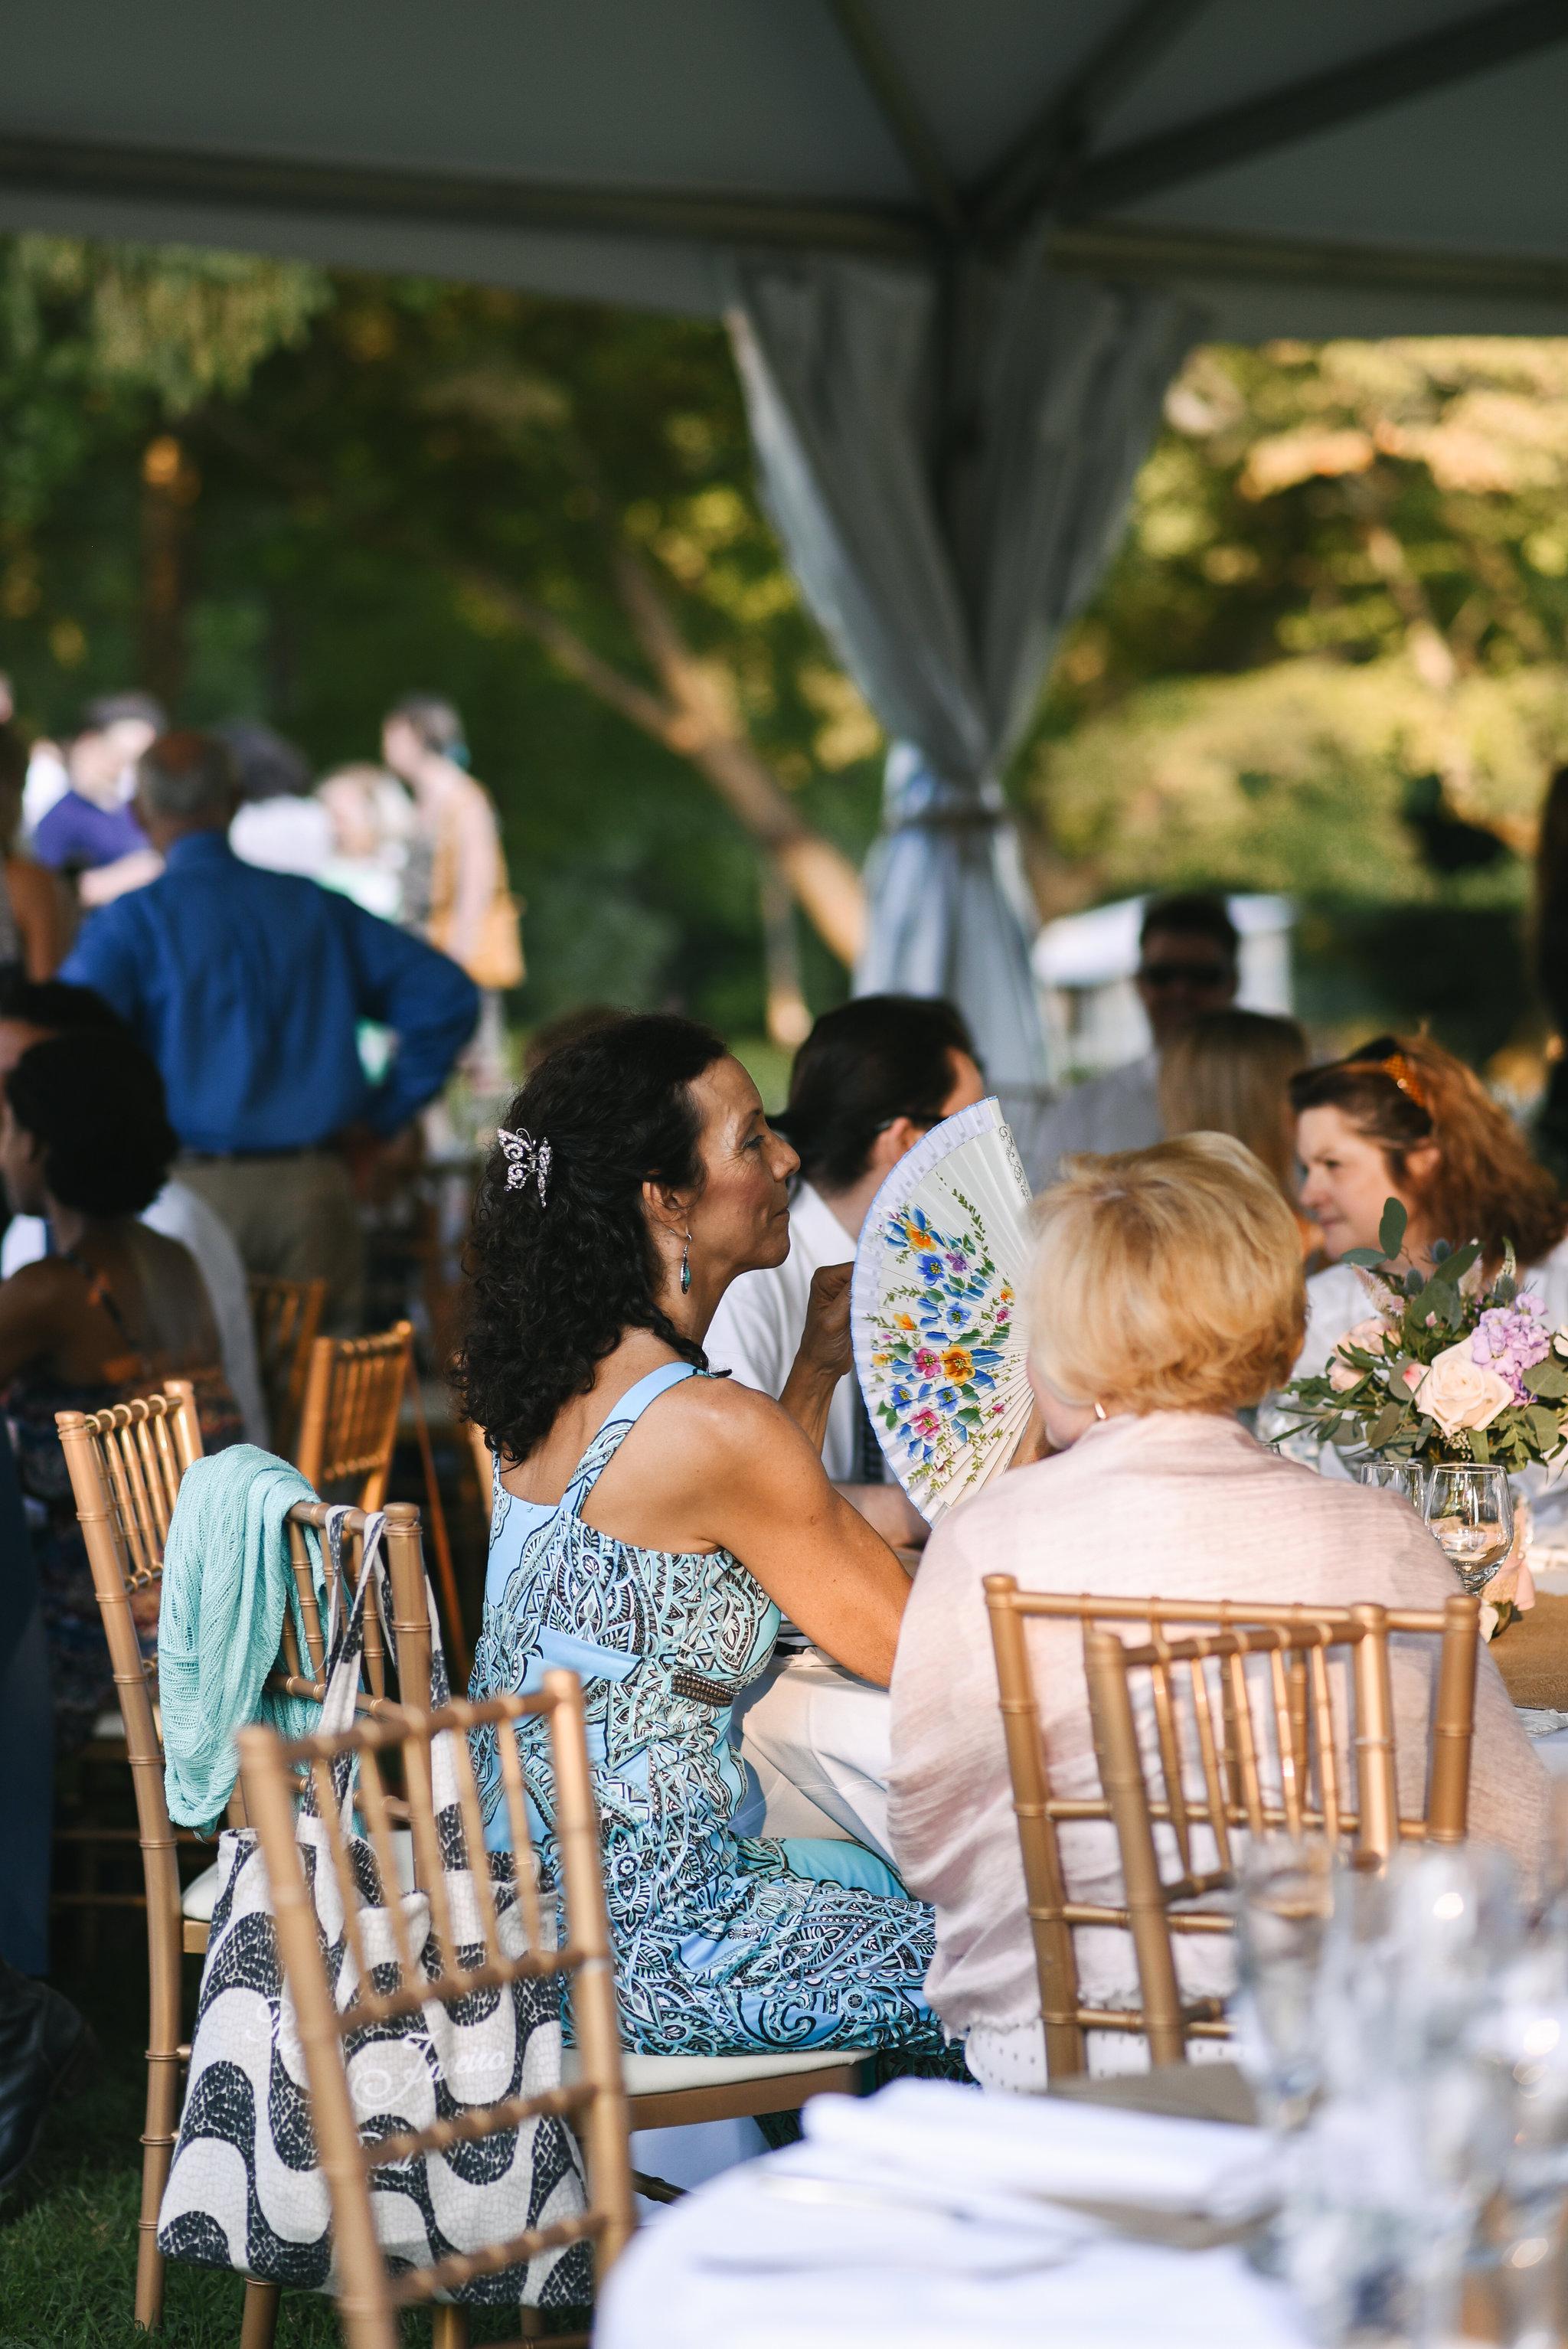 Maryland, Eastern Shore, Baltimore Wedding Photographer, Romantic, Boho, Backyard Wedding, Nature, Wedding Guest Fanning Herself at Reception